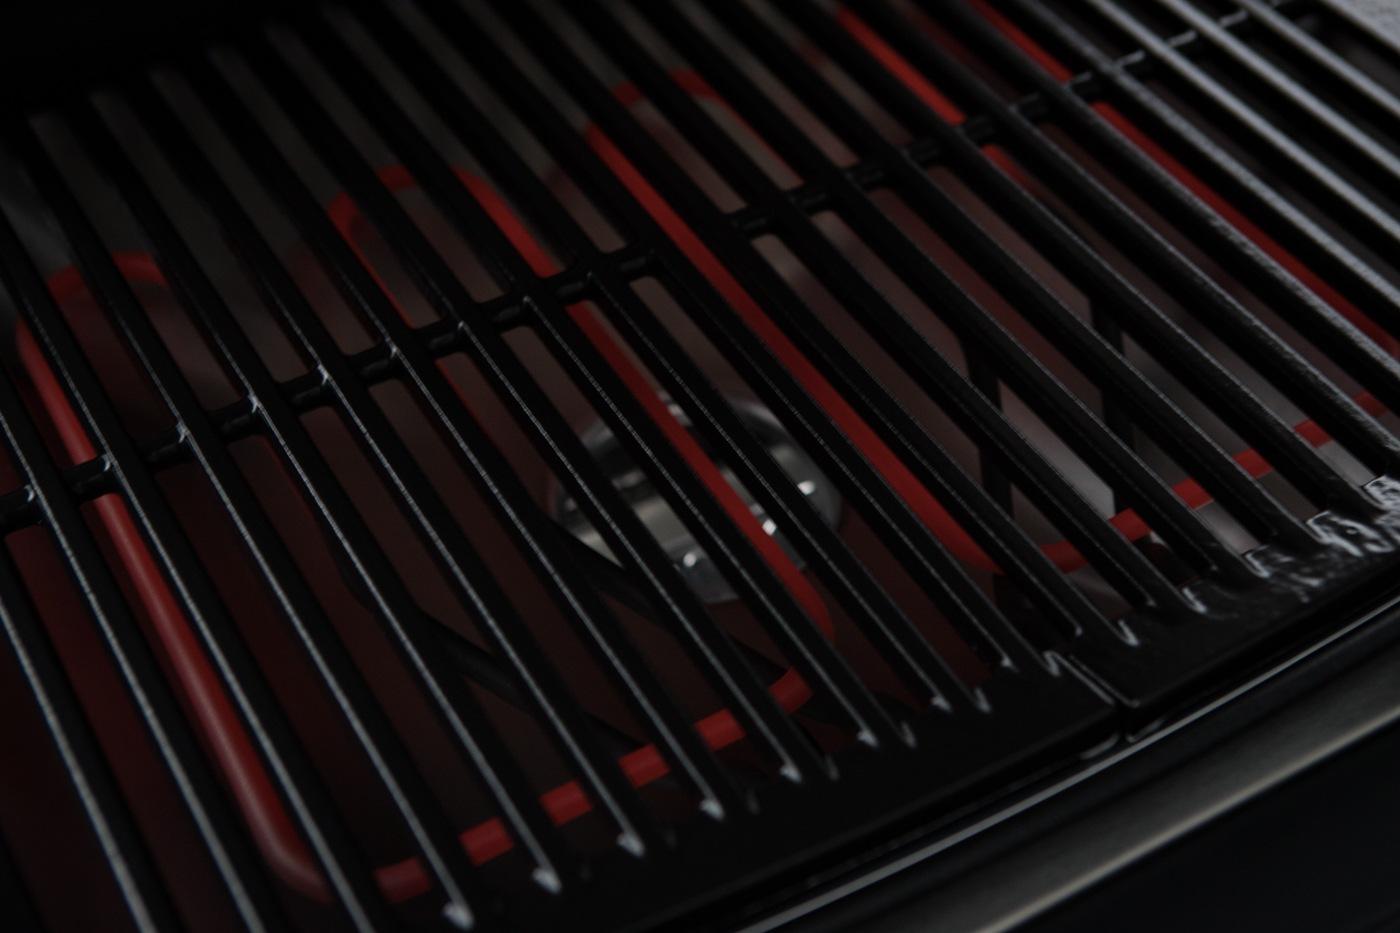 Severin Elektrogrill Aufbau : Vorstellung weber pulse elektrogrill bbqlicate grill